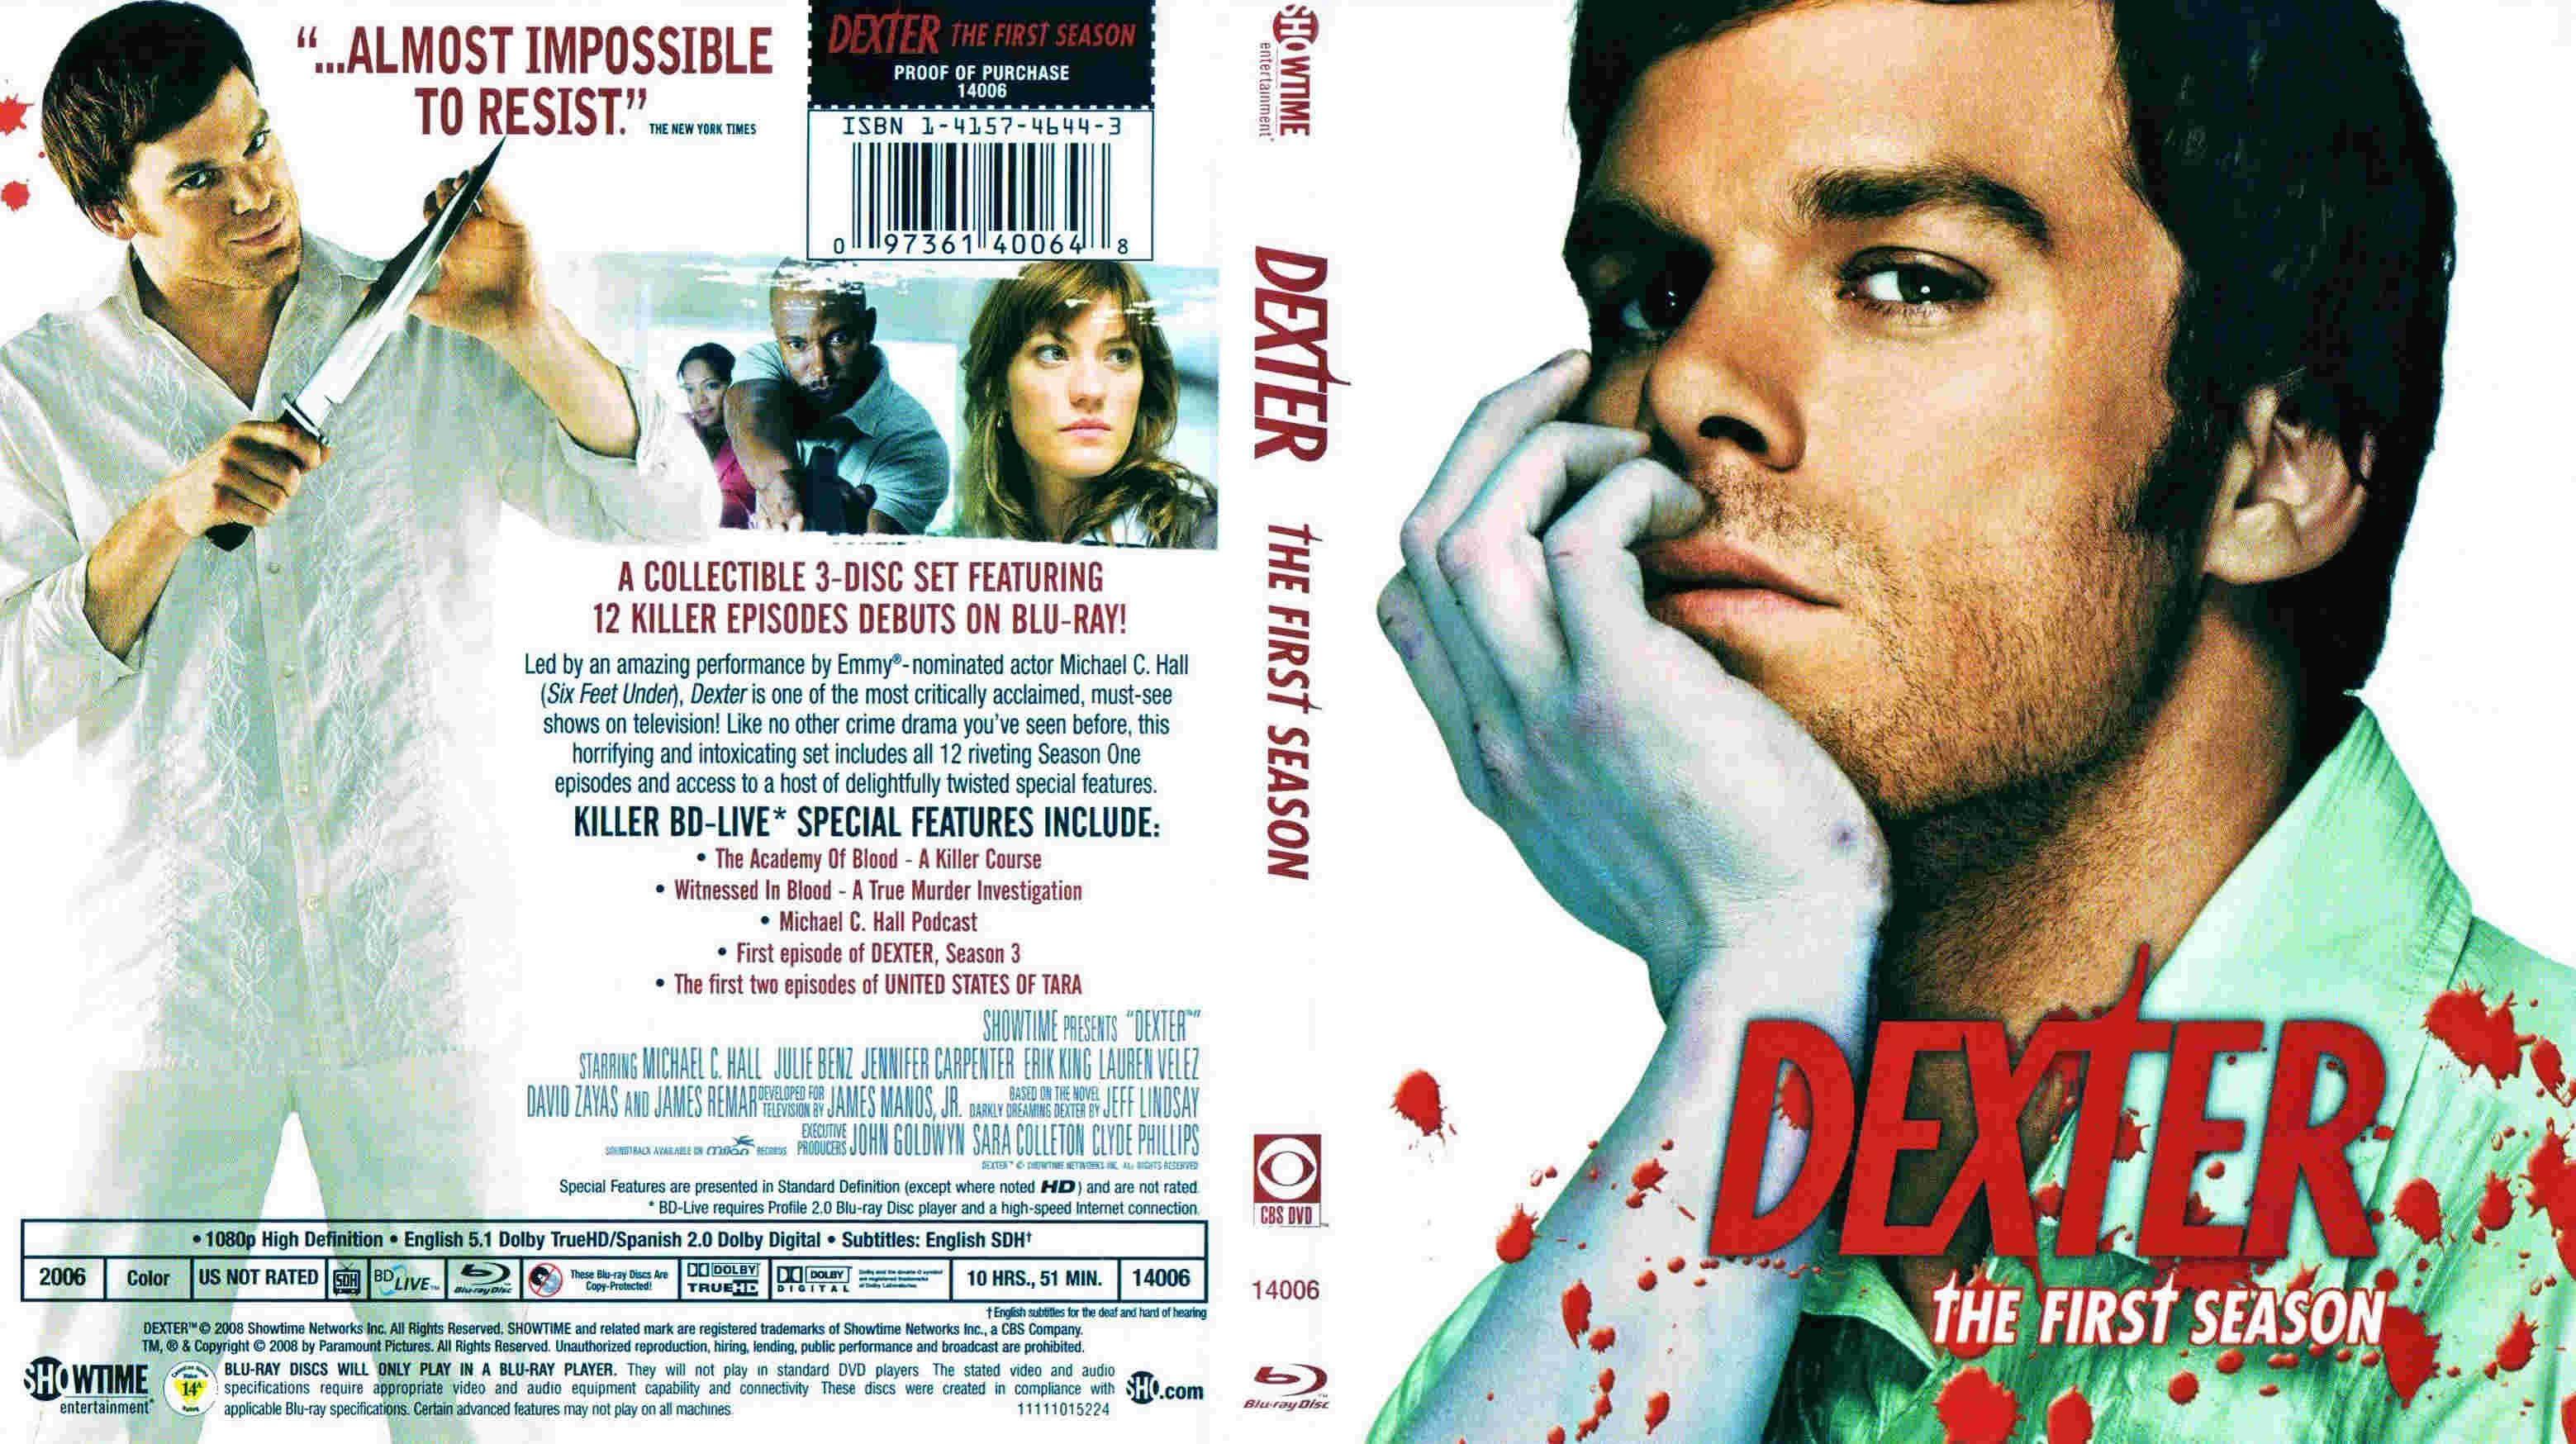 Dexter First Season Blu Ray Ntsc Cover Breaking Bad Seasons Dexter Seasons Breaking Bad Season 2